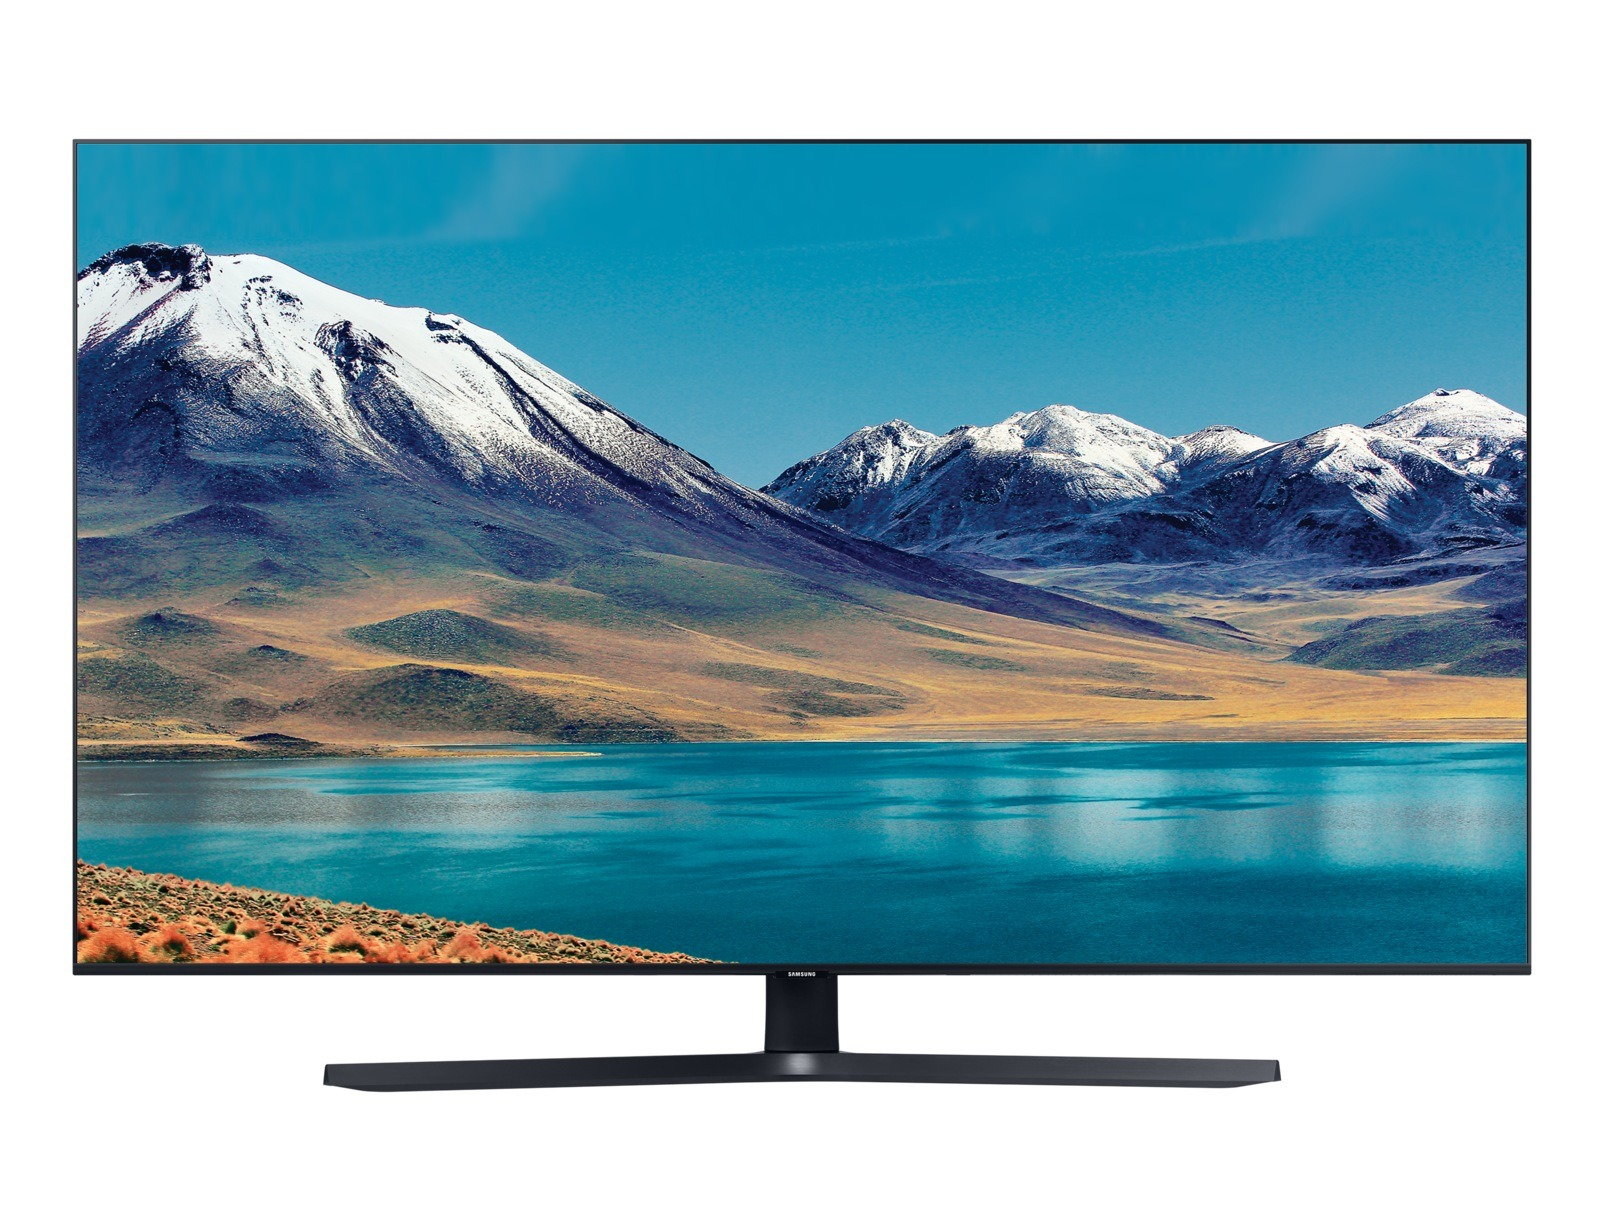 Samsung UE43TU8500S 43 inch UHD TV